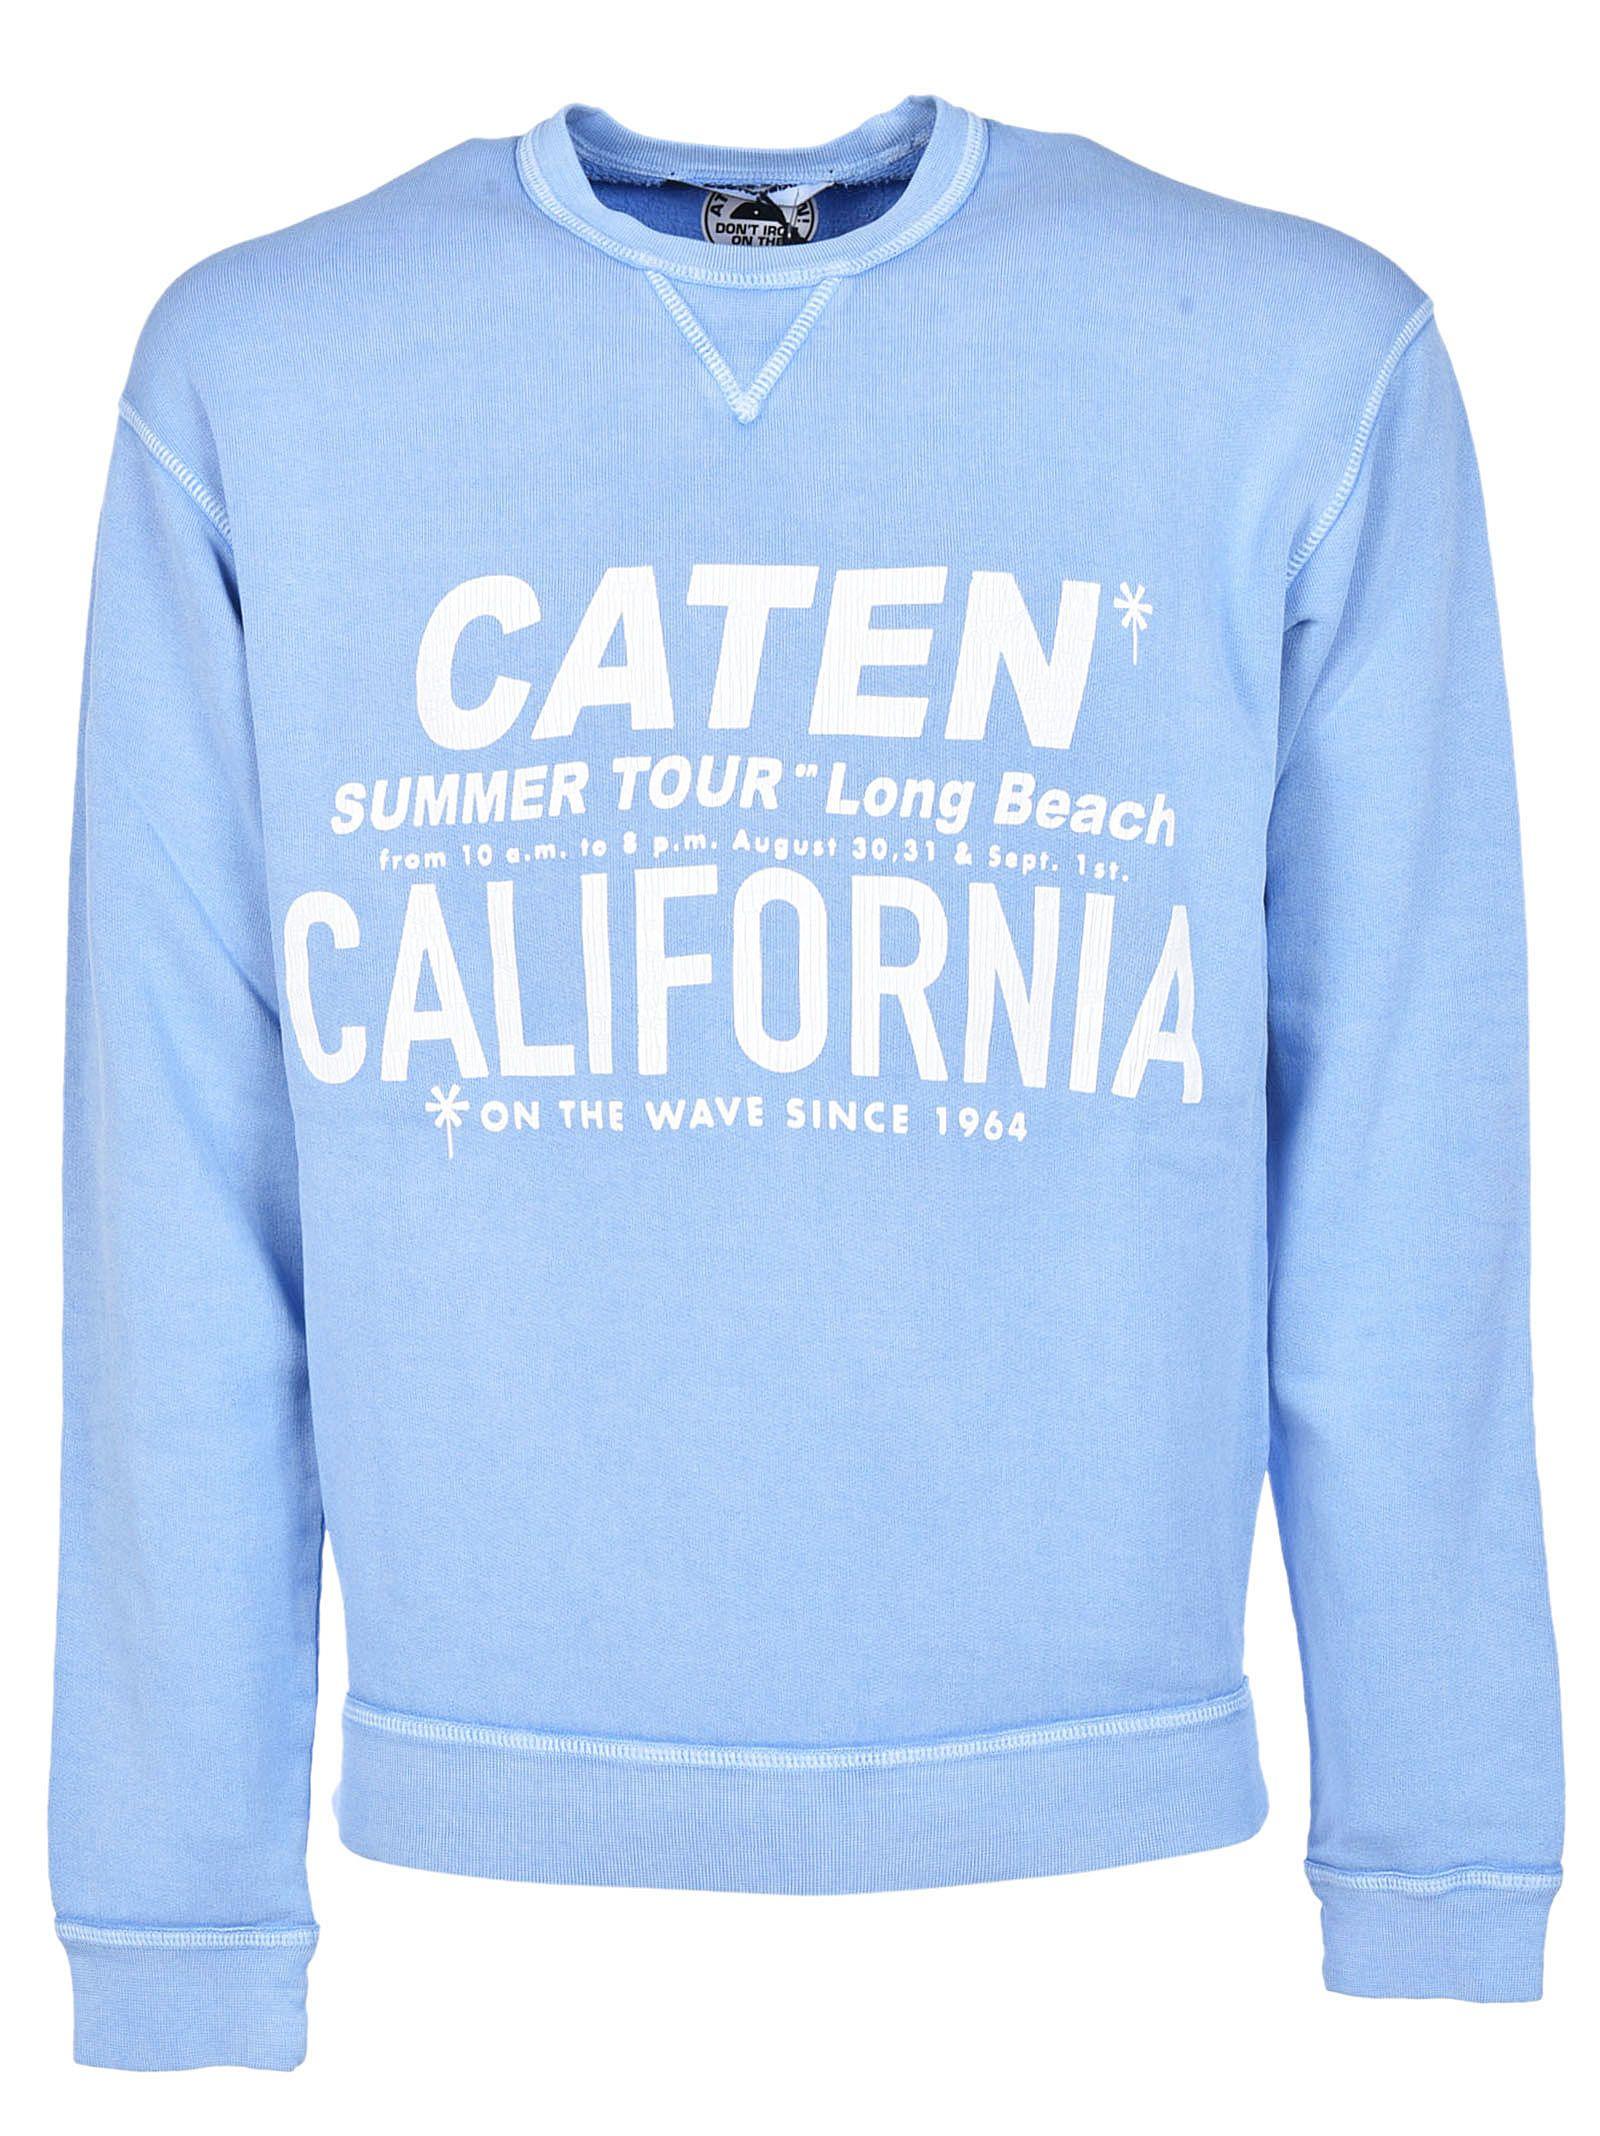 Dsquared2 California Summer Tour Sweatshirt